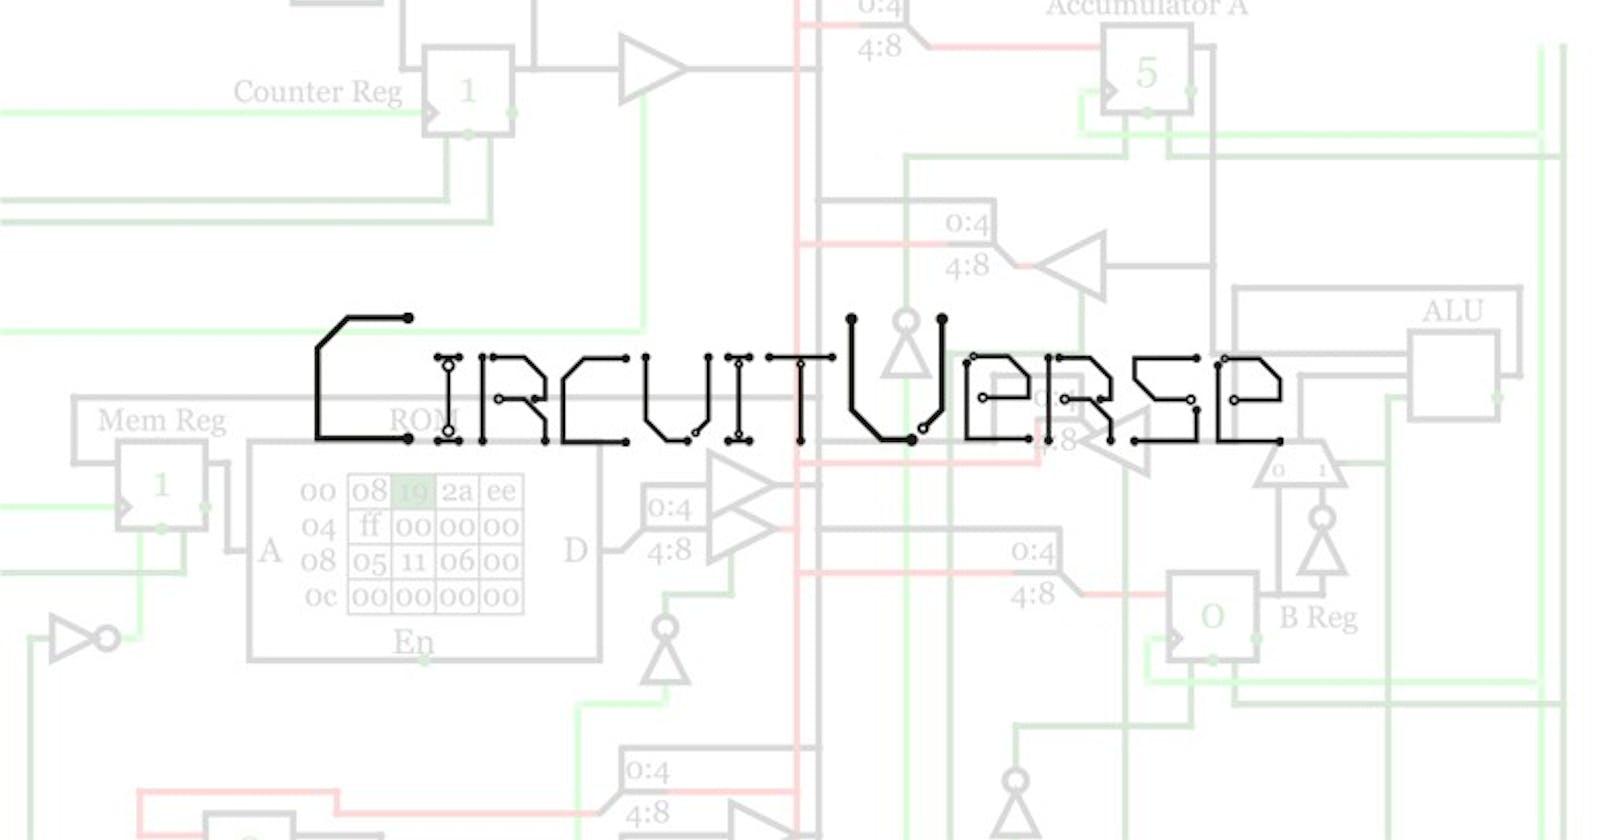 Exploring CircuitVerse